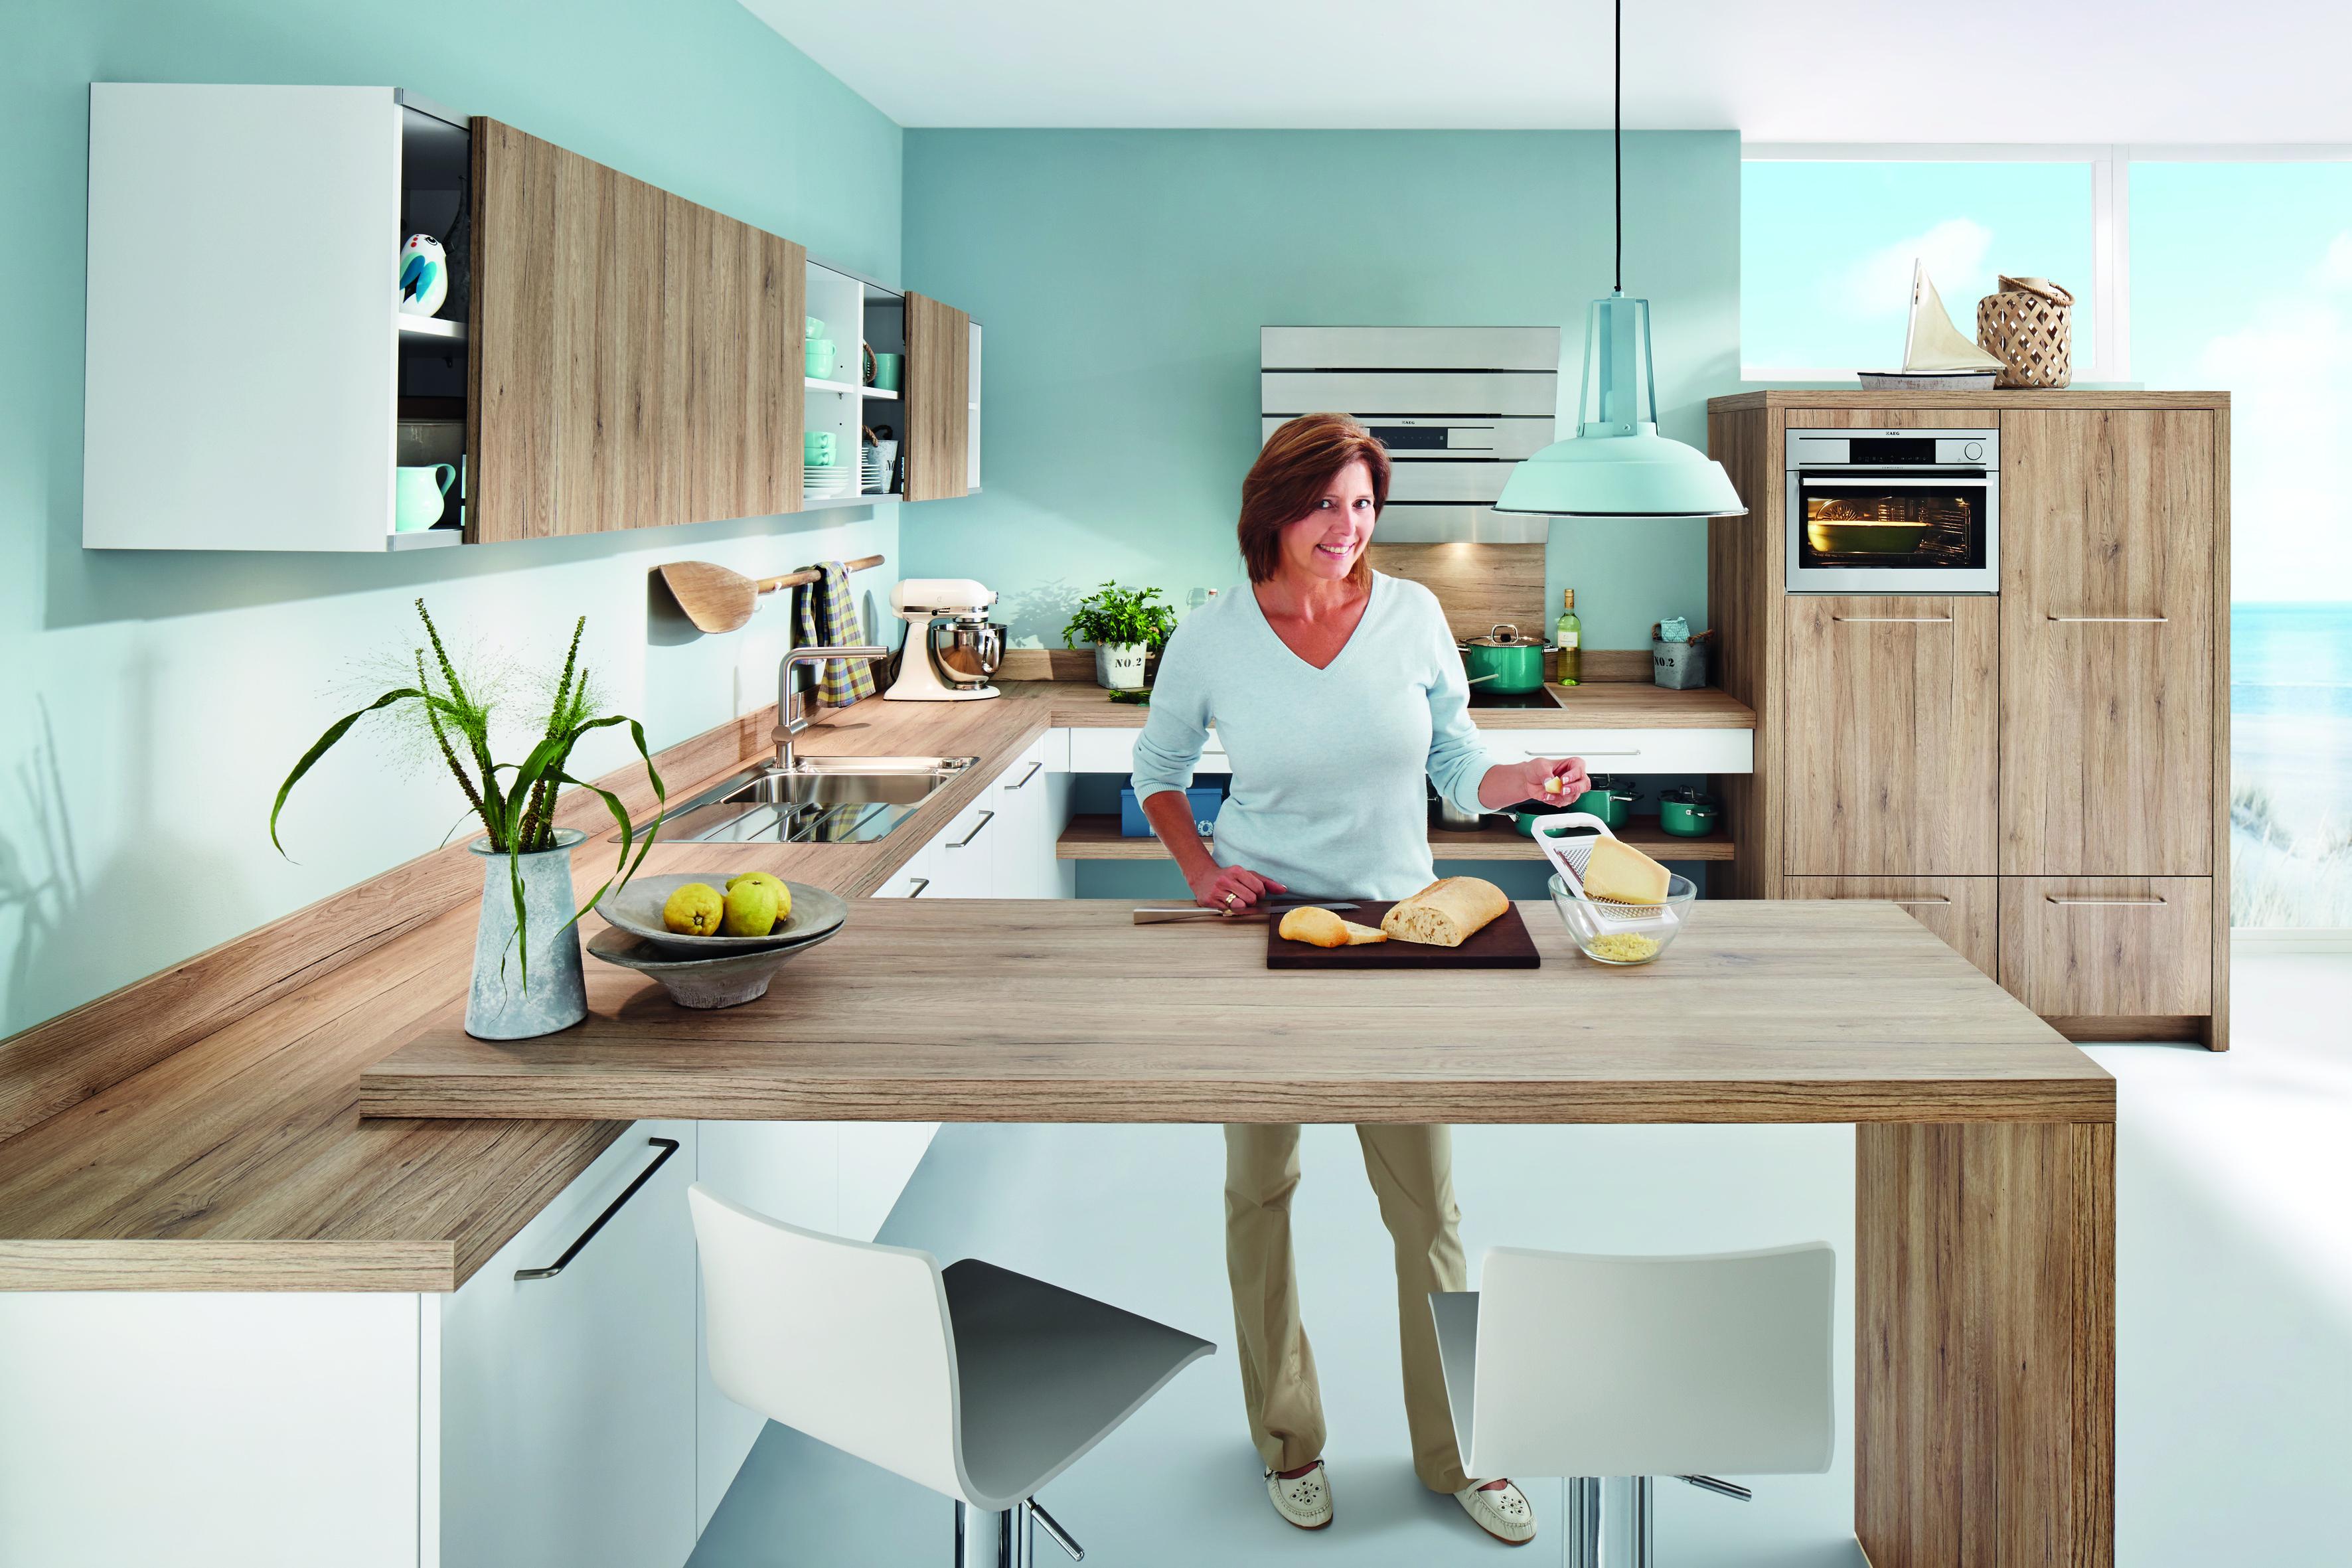 Meyer Totaal keukens en Sanitair in HILLEGOM Startpagina voor ...